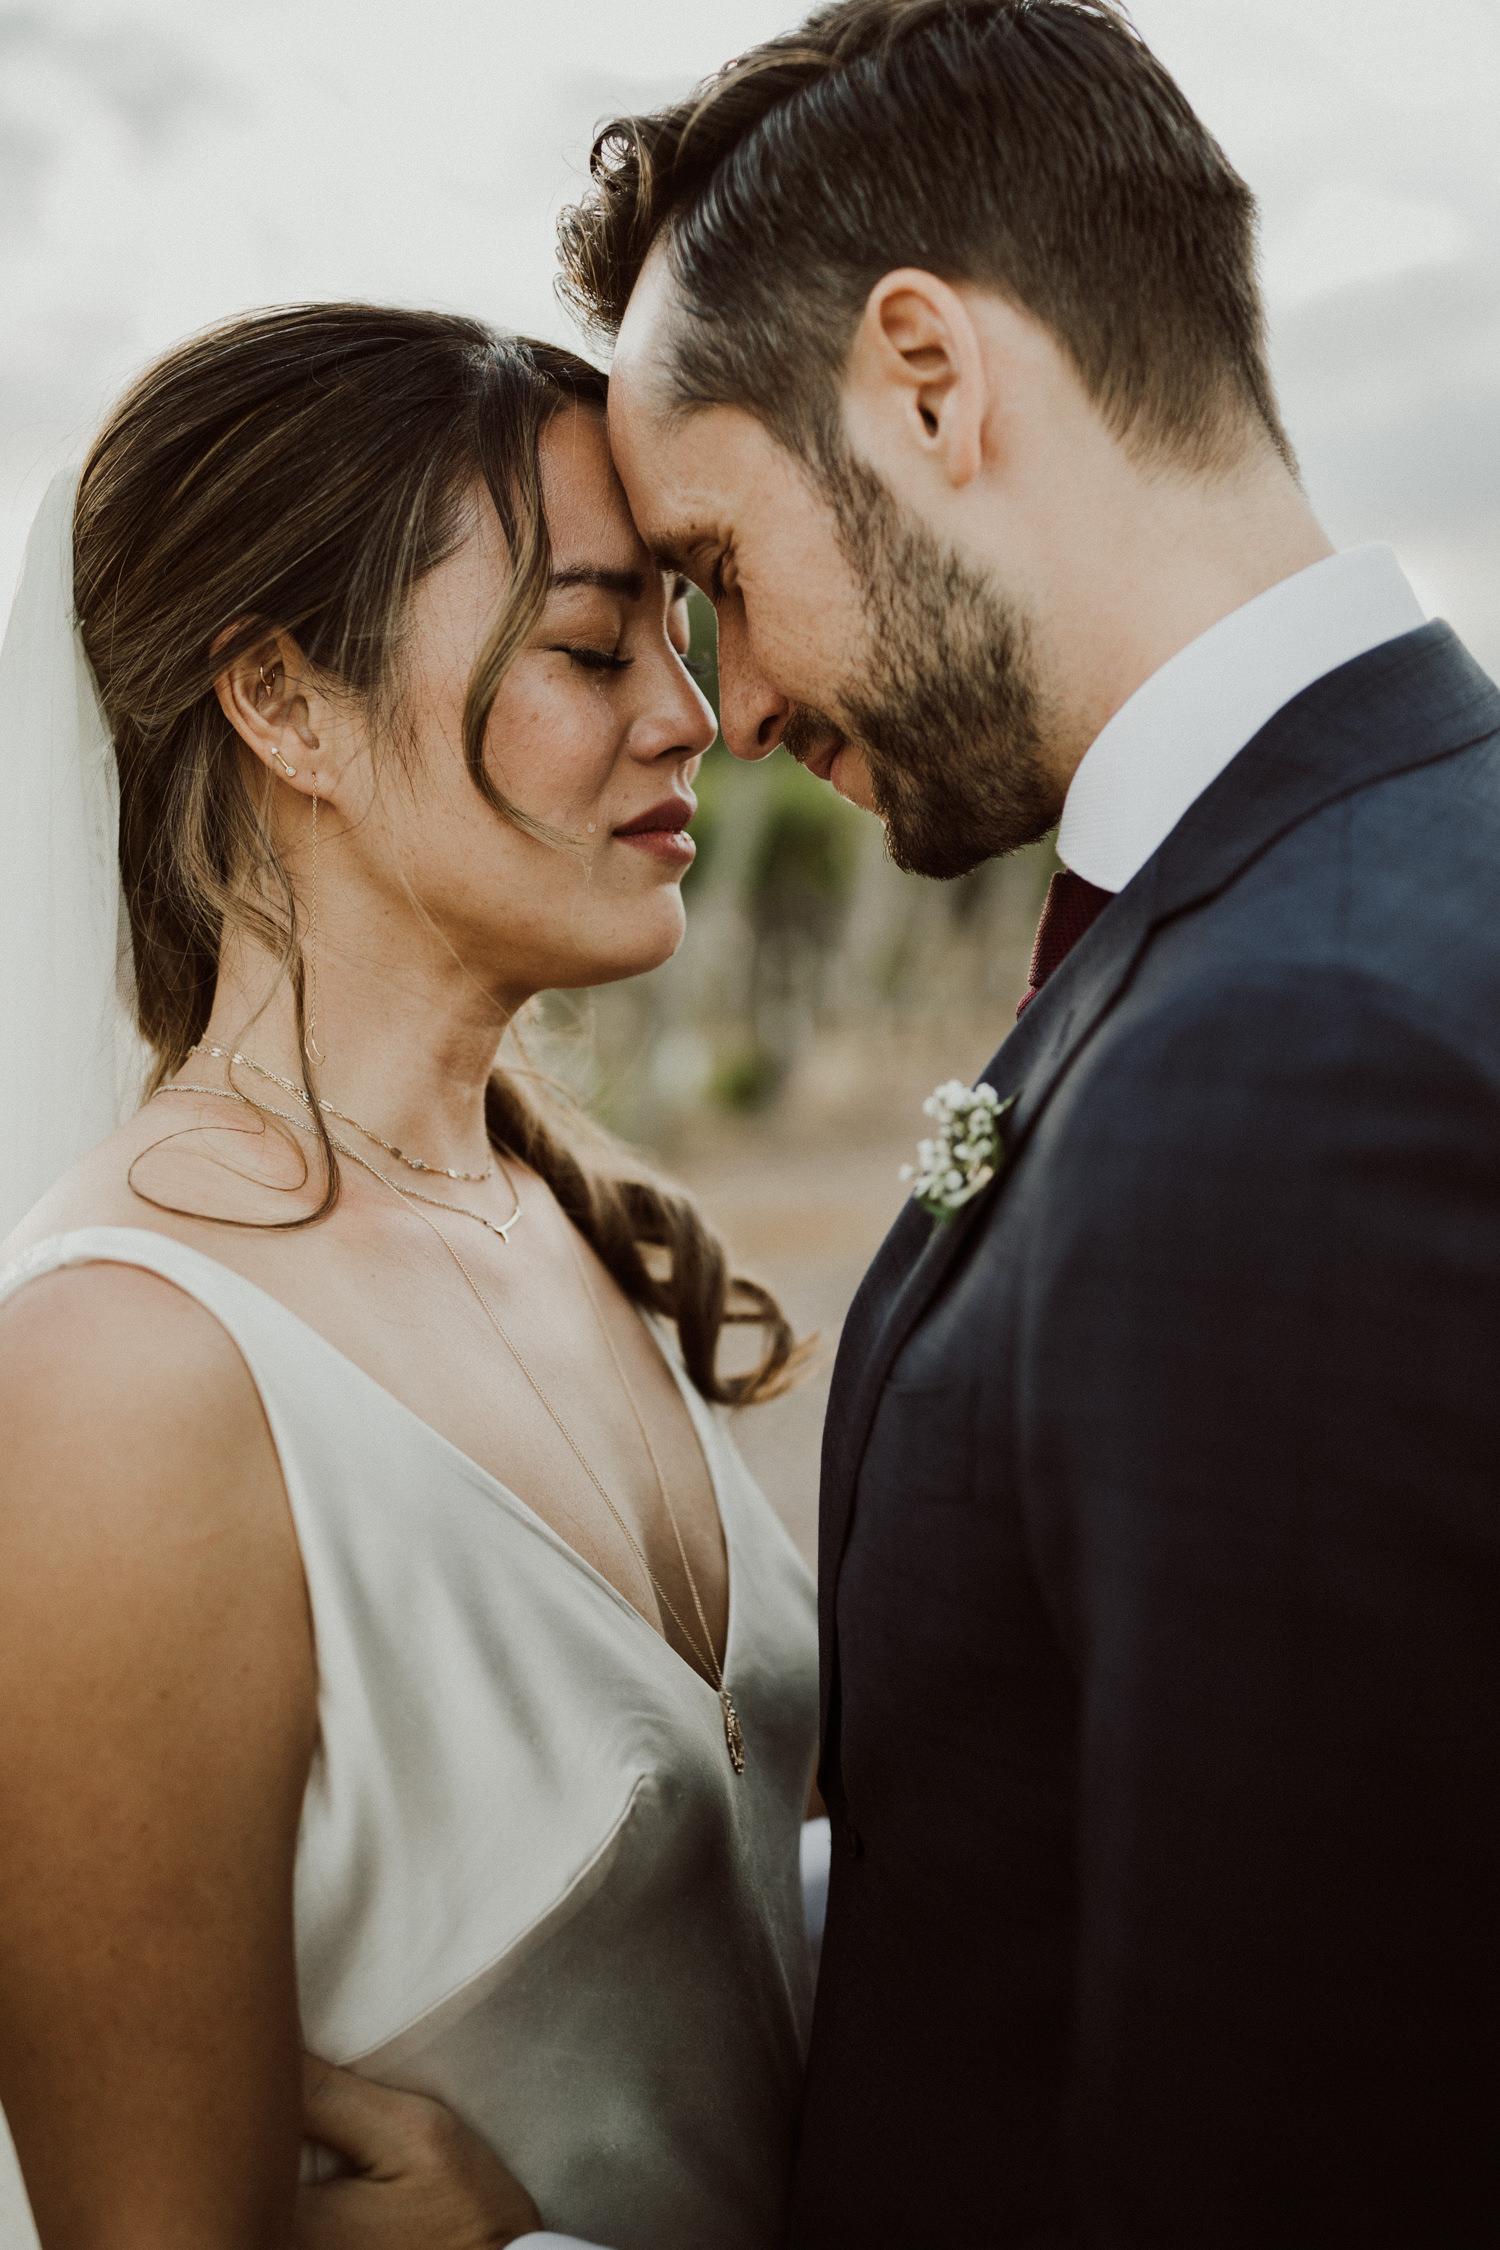 cedarandpines-kasey-erich-wedding-29.jpg